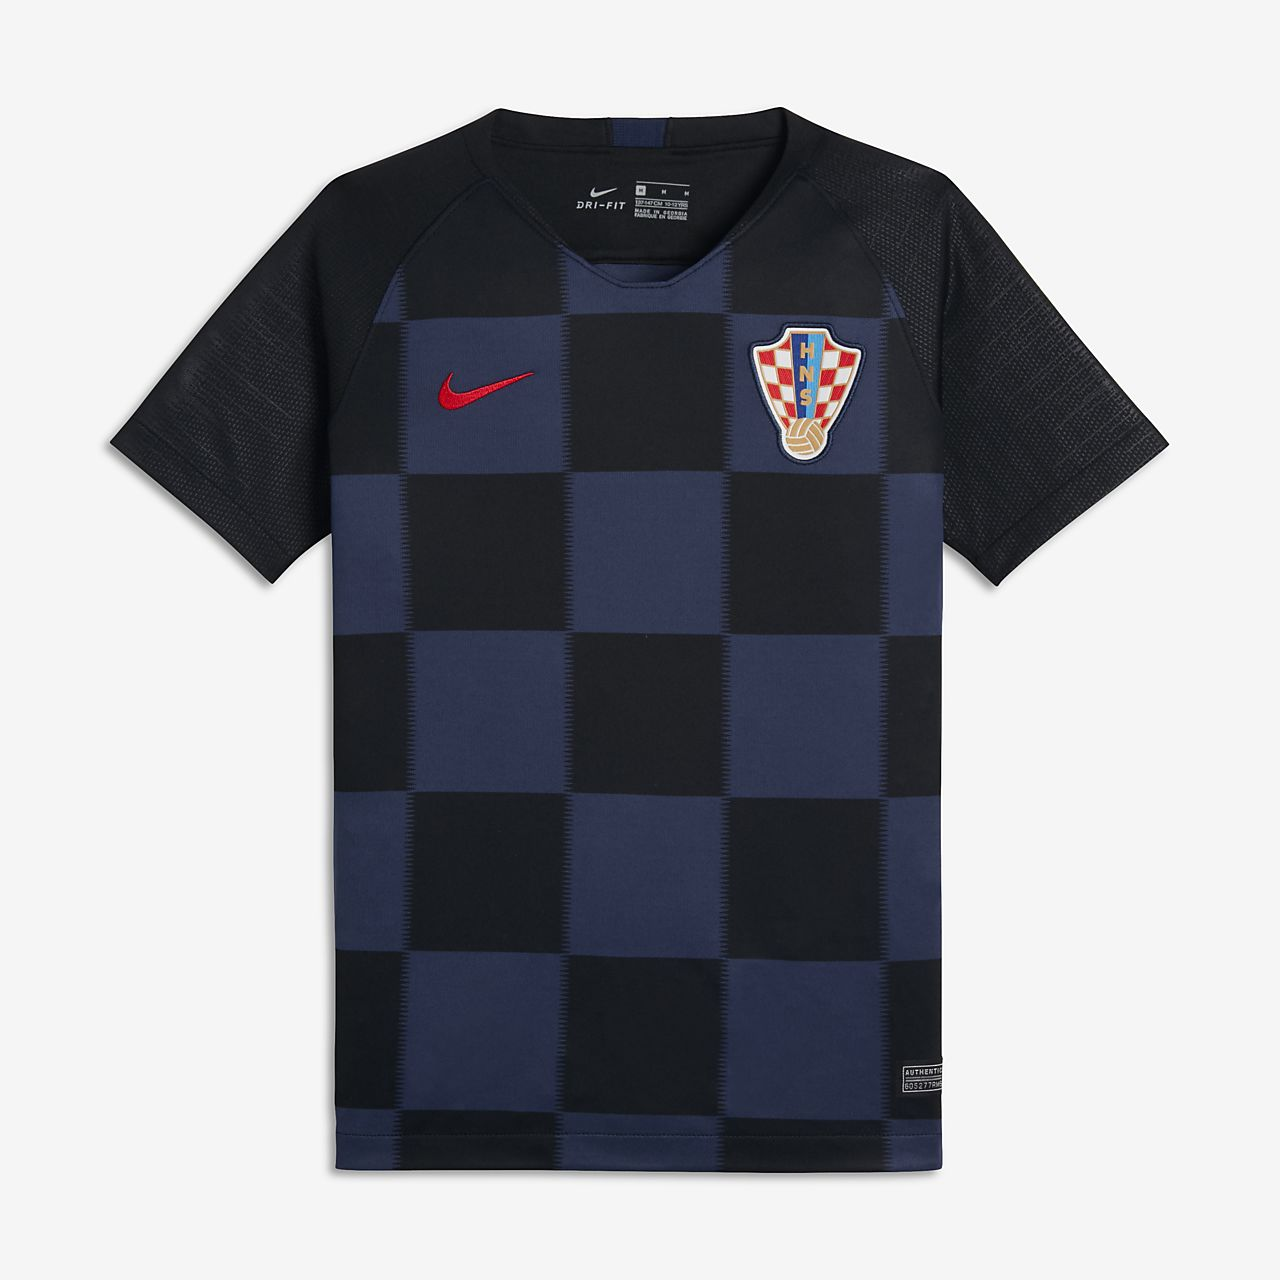 Camiseta de fútbol para niños talla grande 2018 Croatia Stadium Away